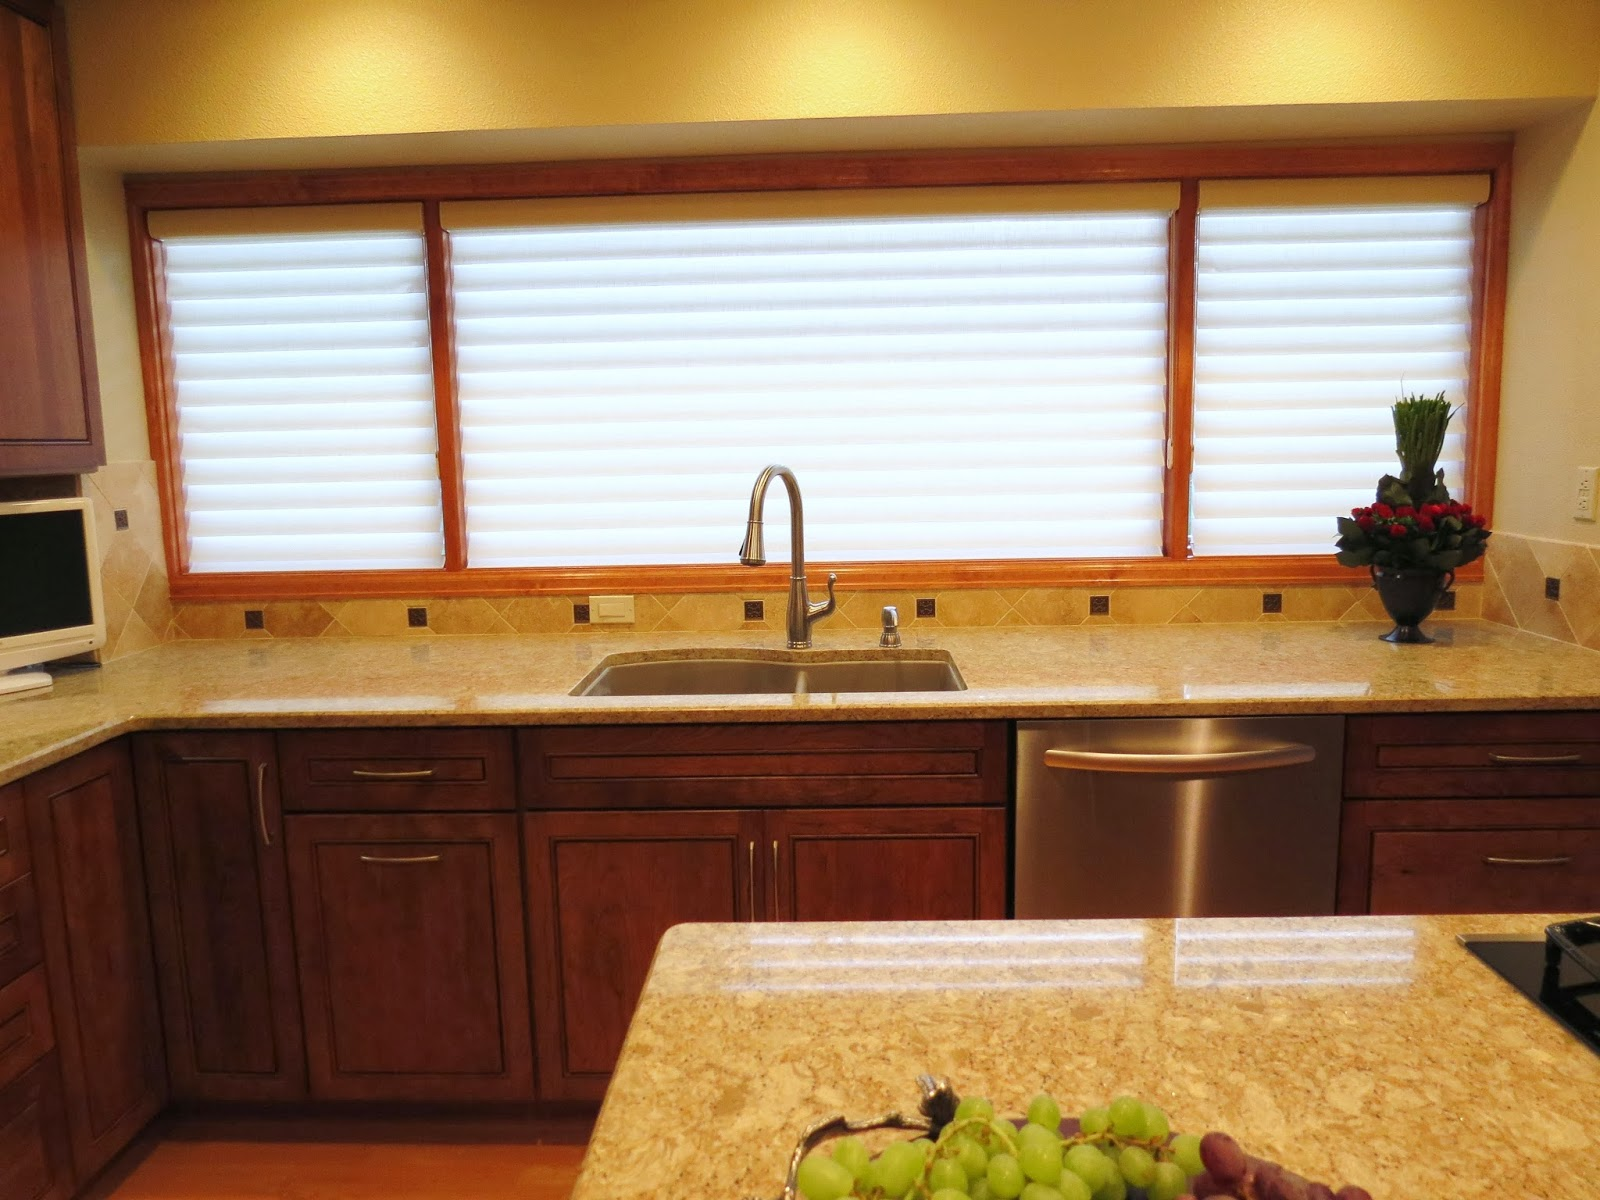 c2Design: Golden Kitchen Remodel